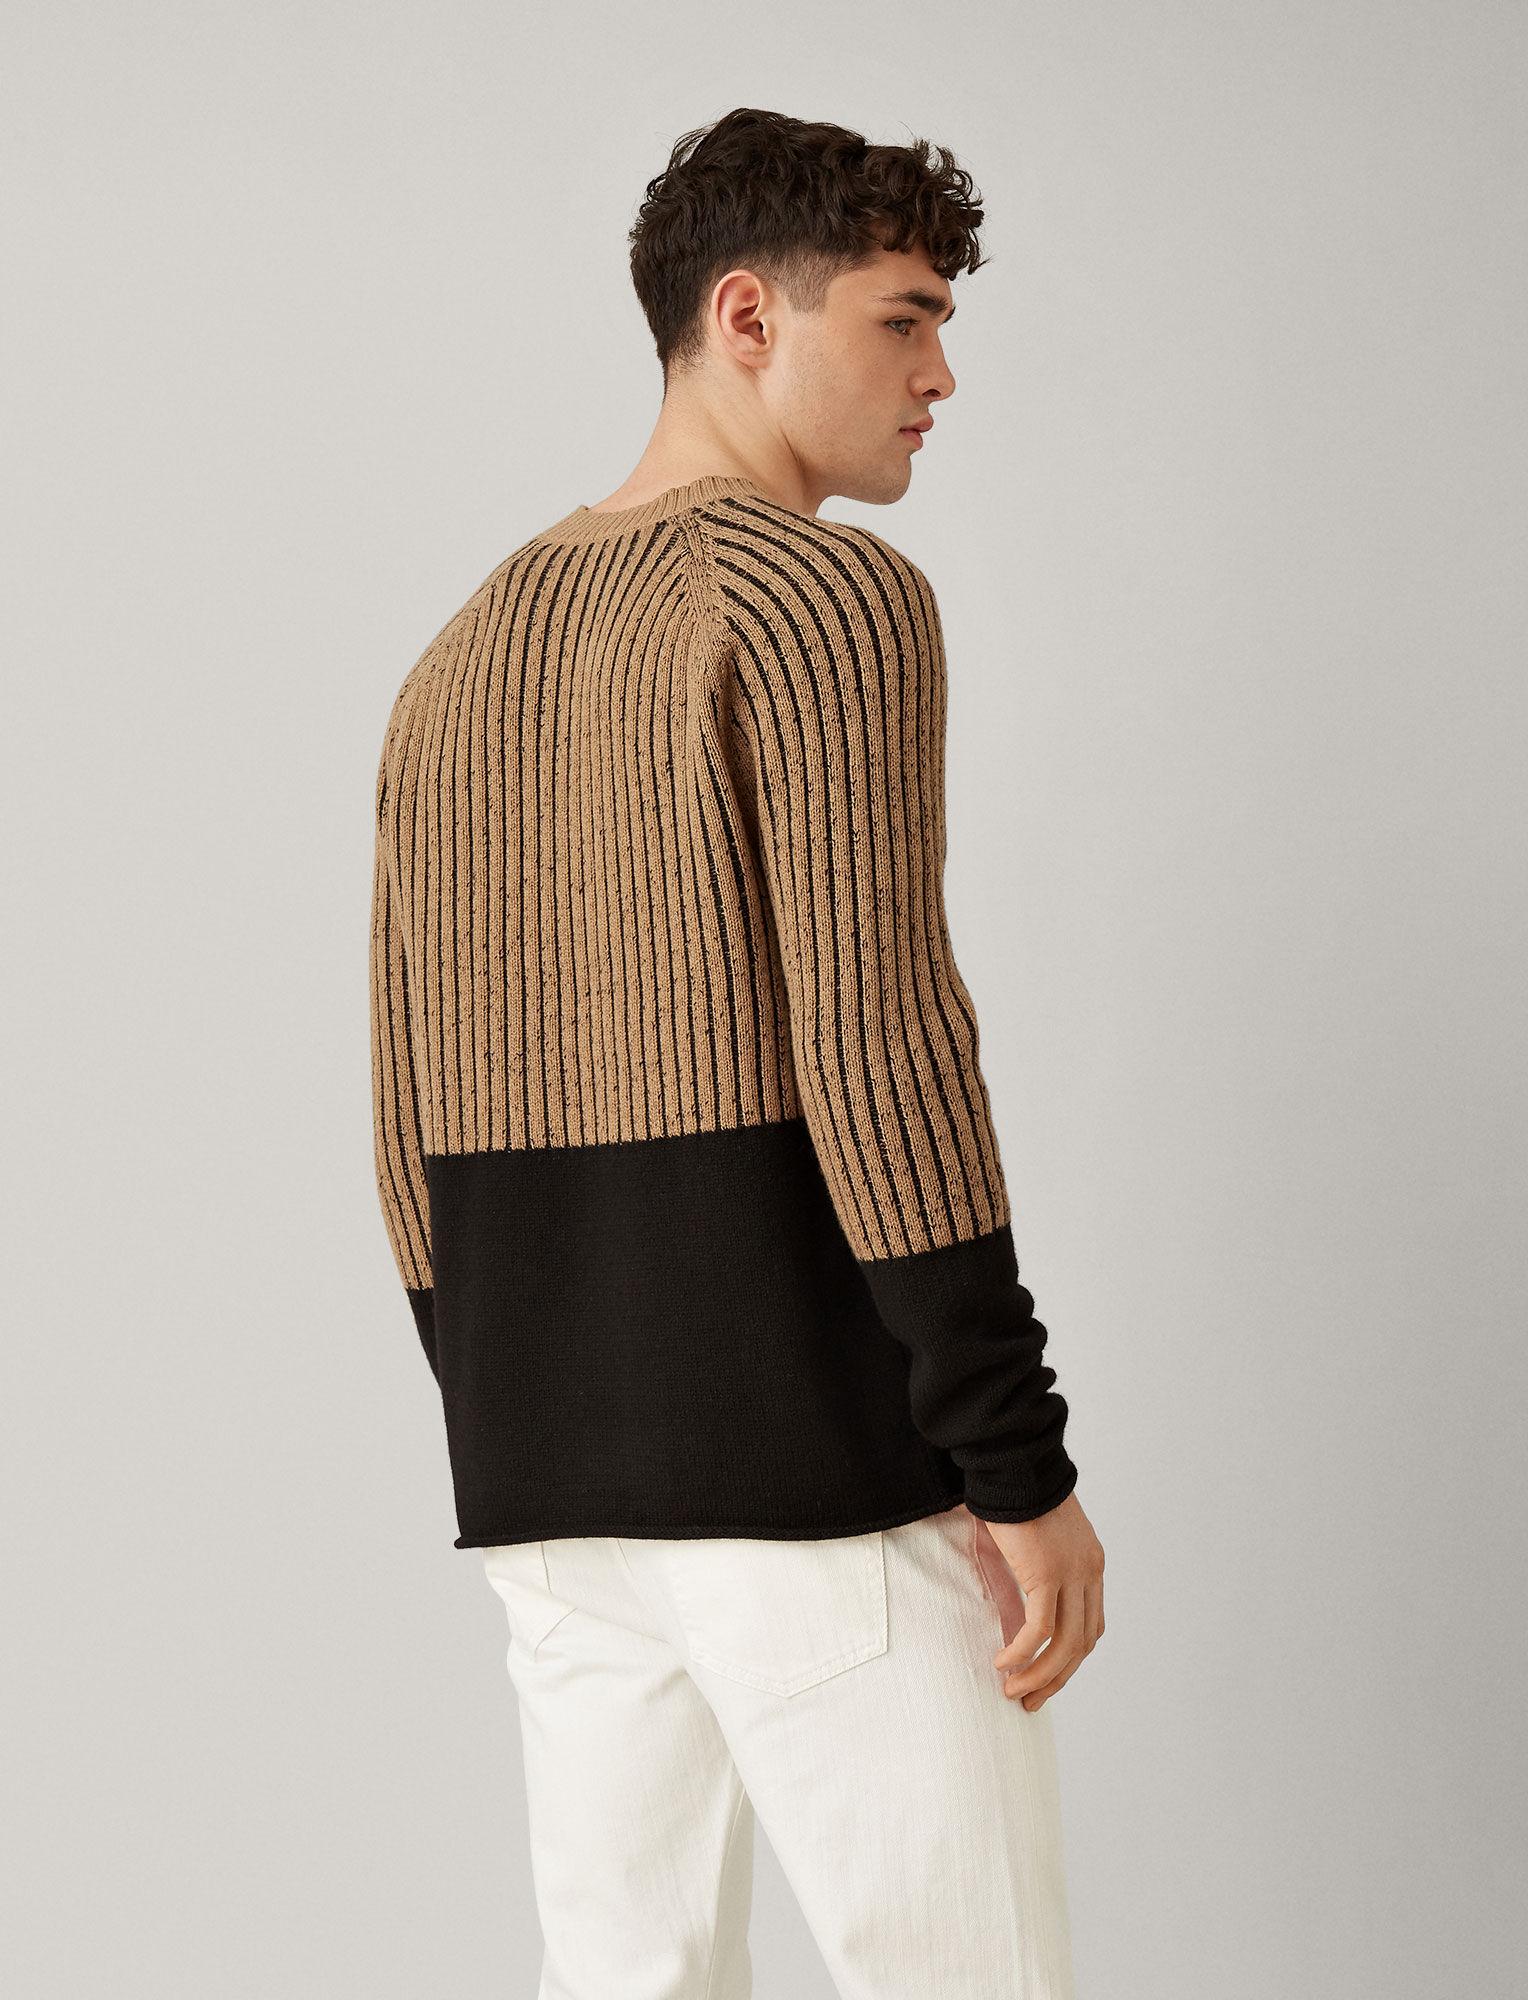 Joseph, V Neck Soft Wool Block Knit, in CAMEL/BLACK